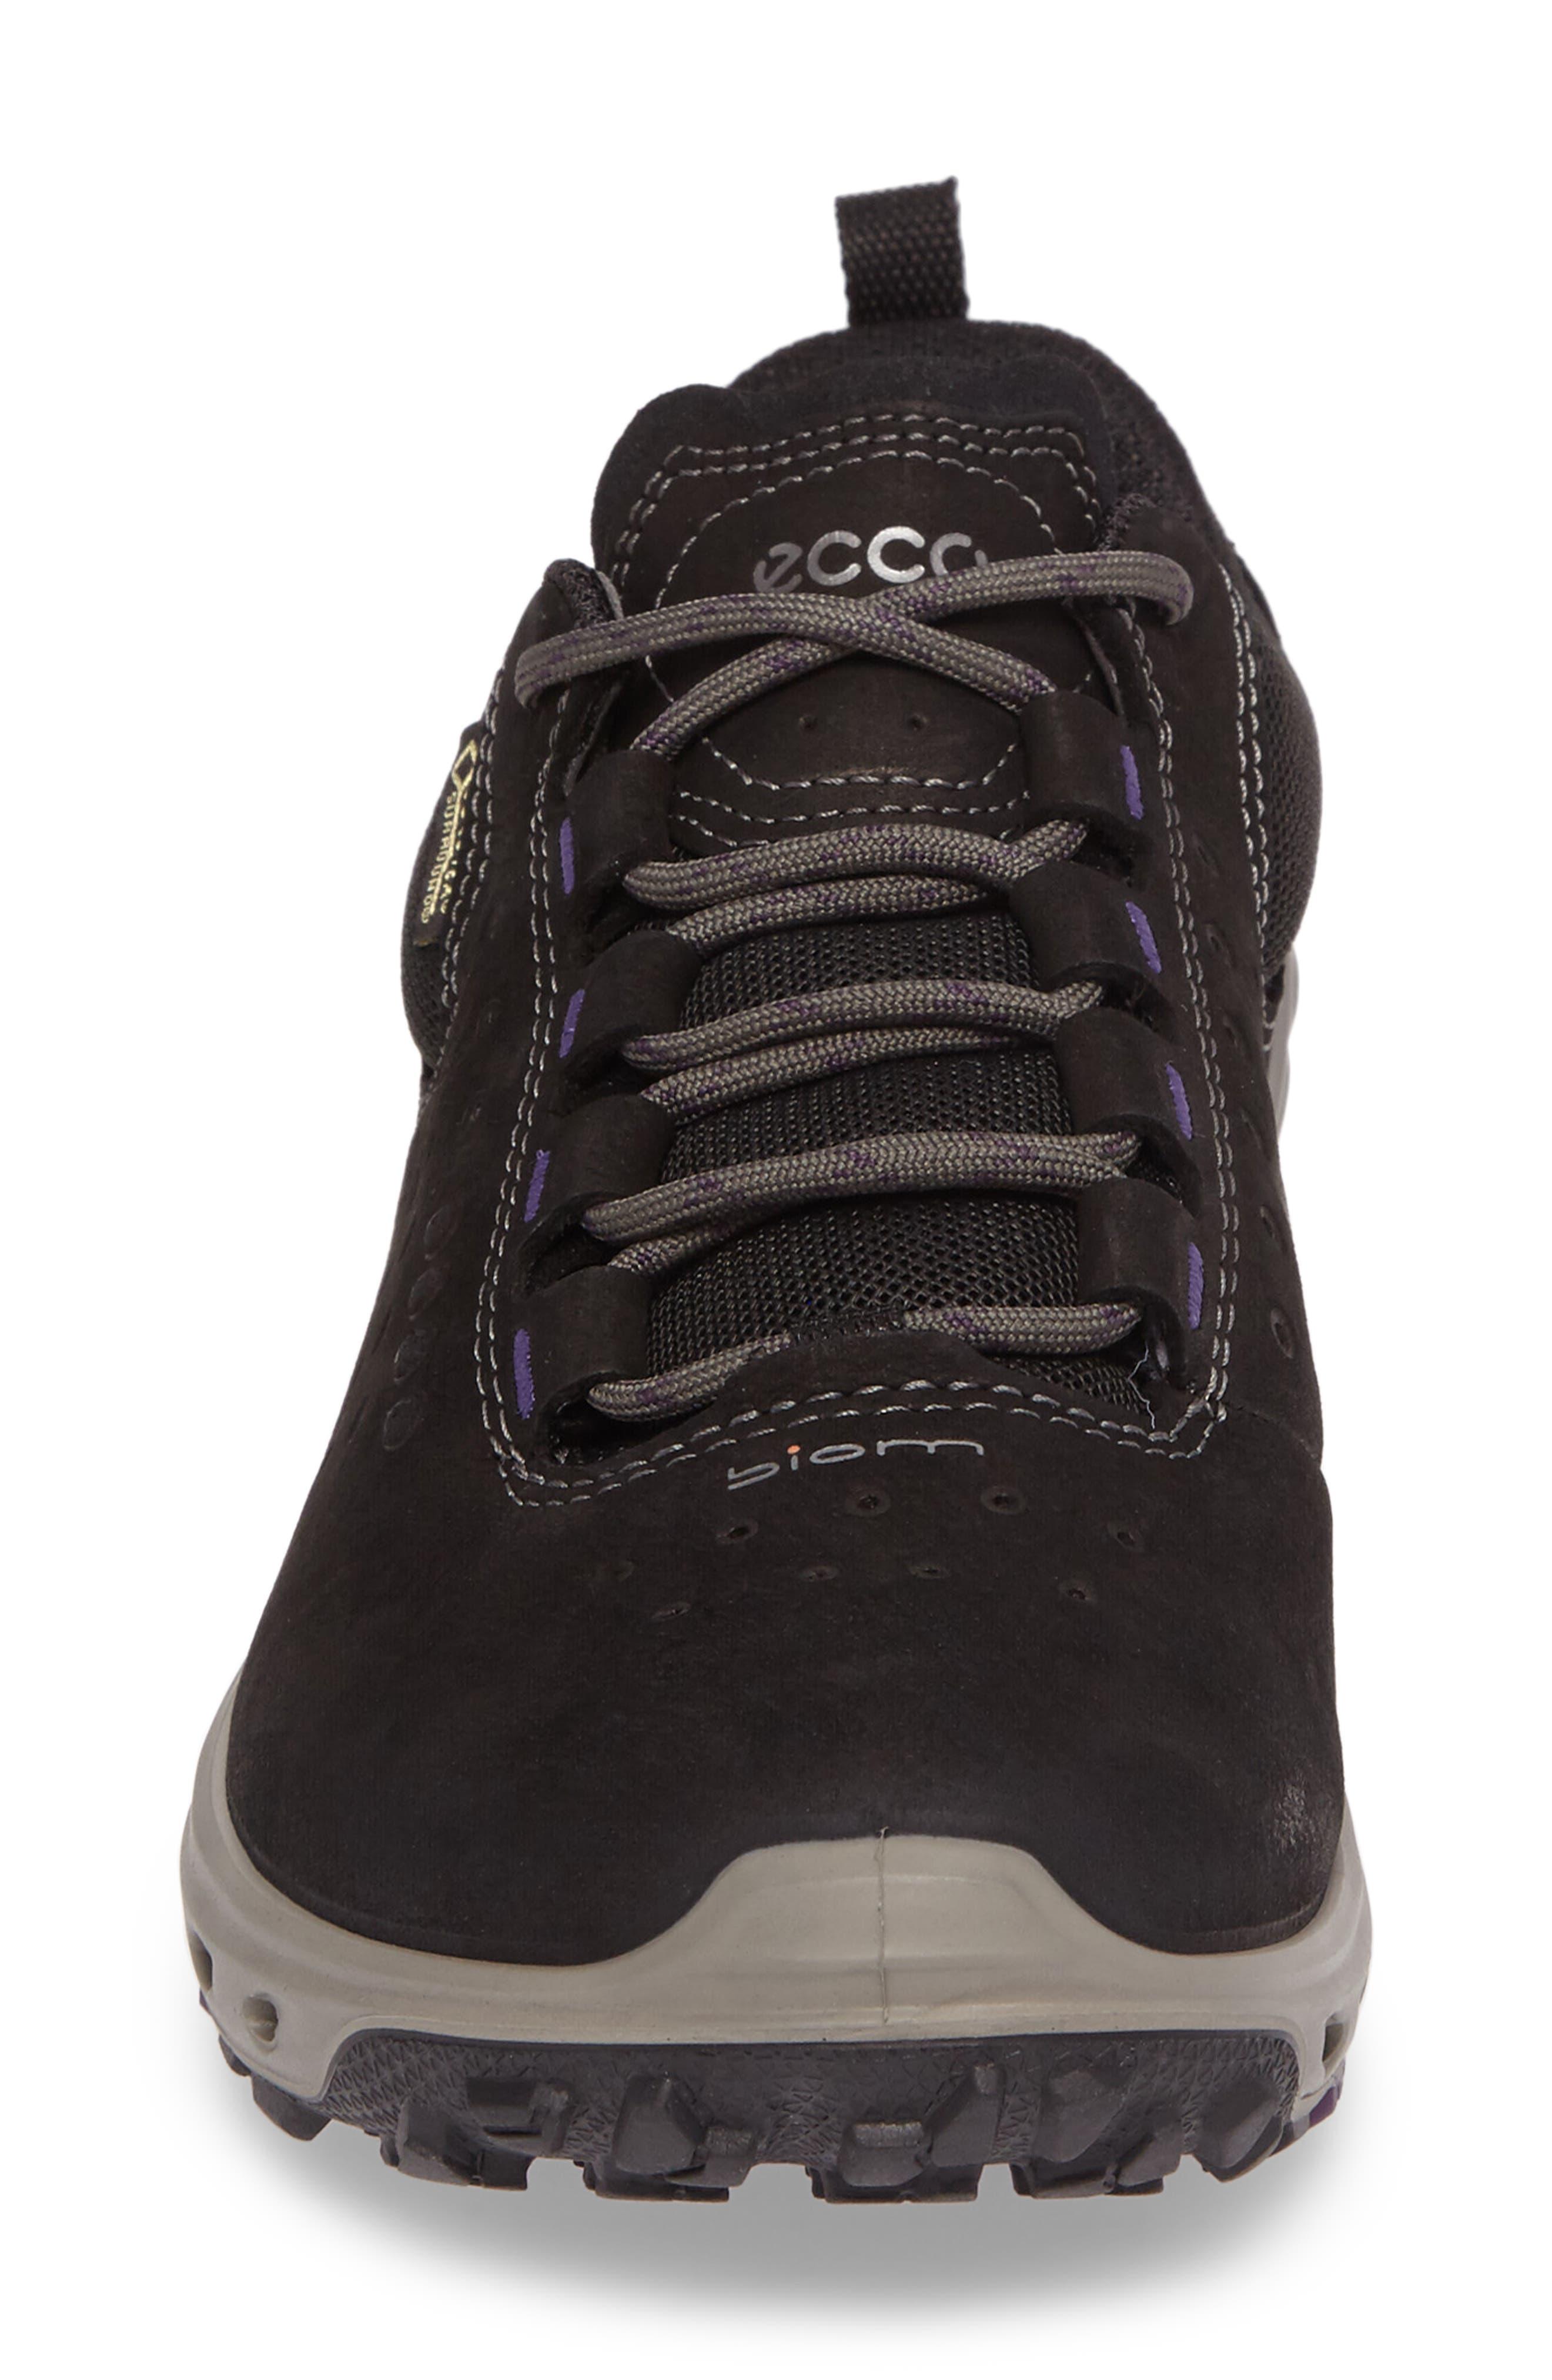 BIOM Venture GTX Sneaker,                             Alternate thumbnail 4, color,                             BLACK LEATHER